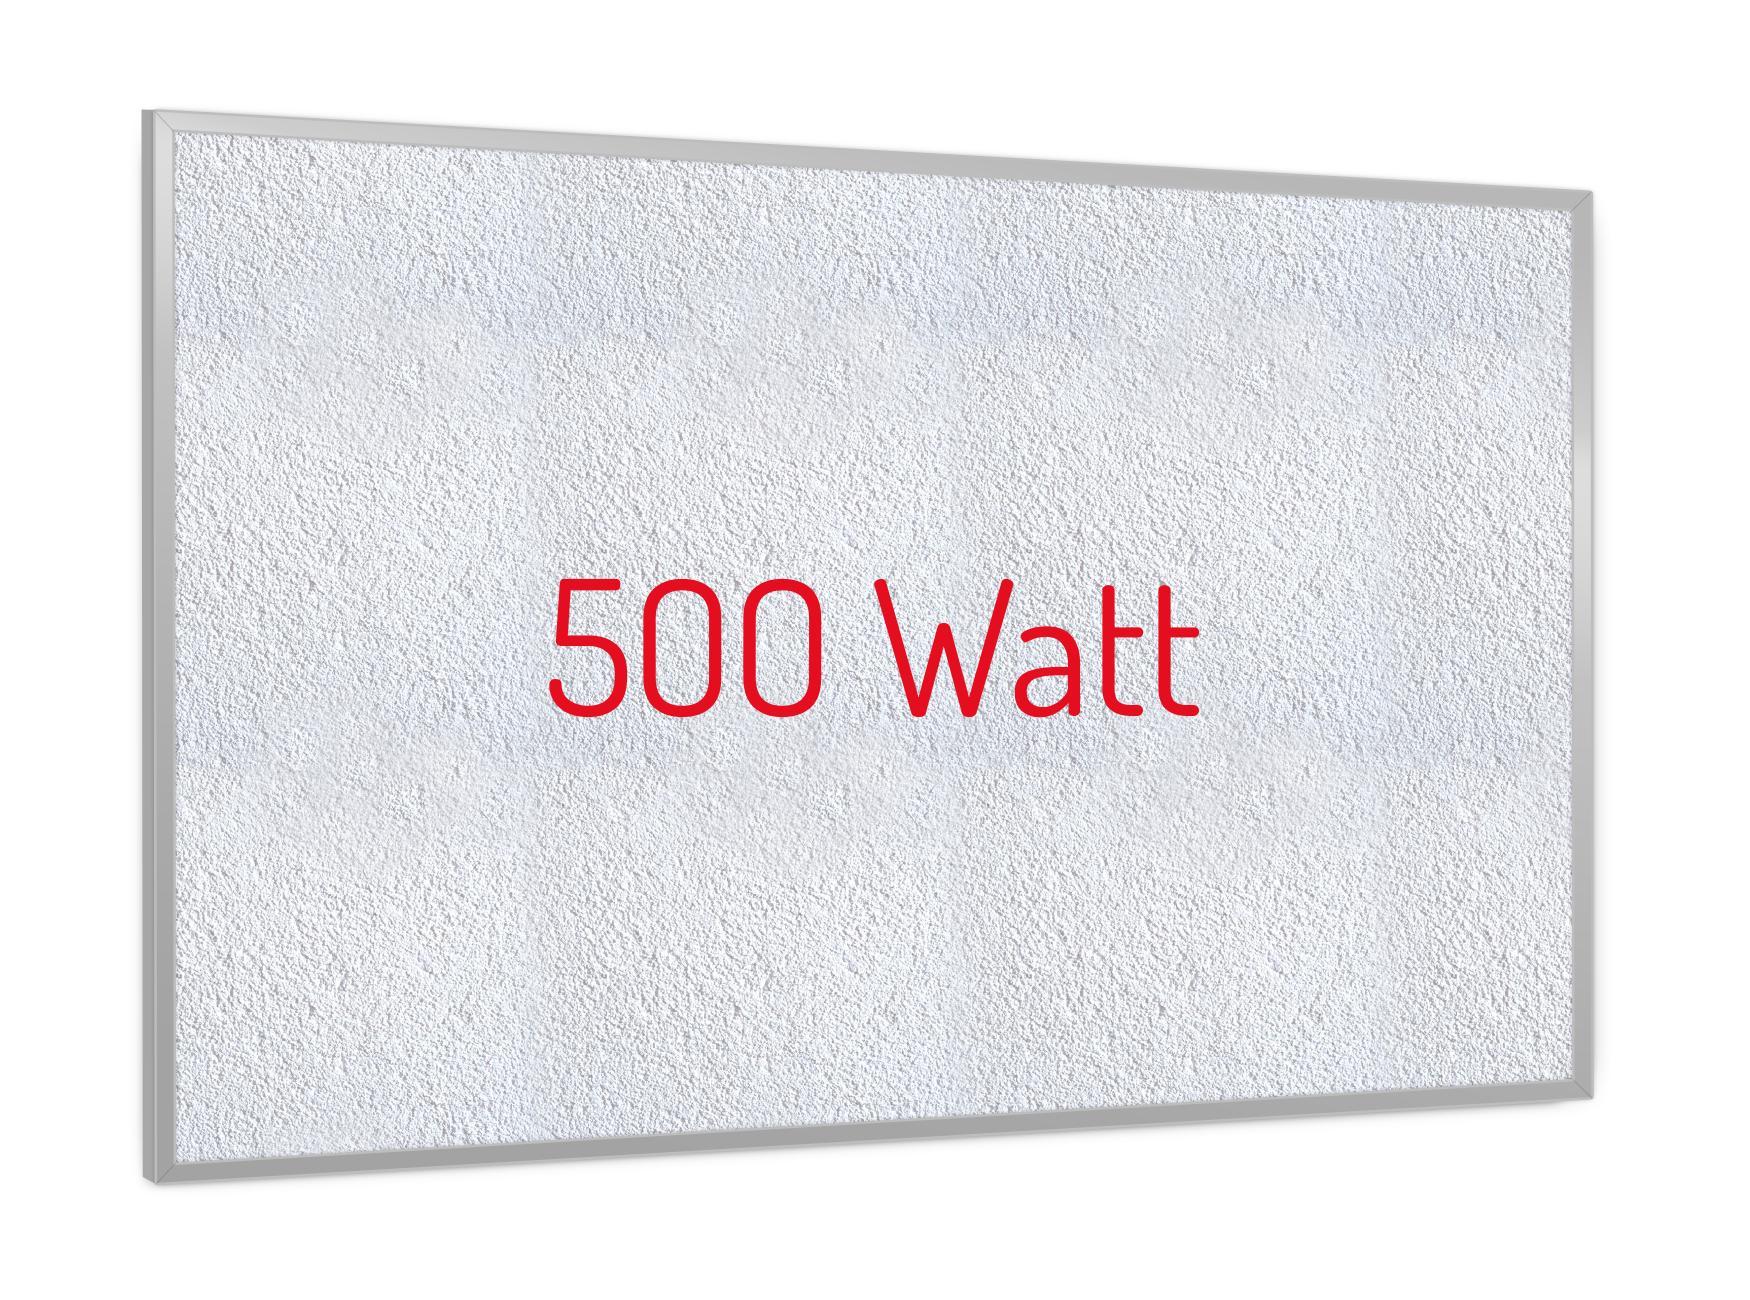 PowerSun Reflex 500 Watt 60x90cm